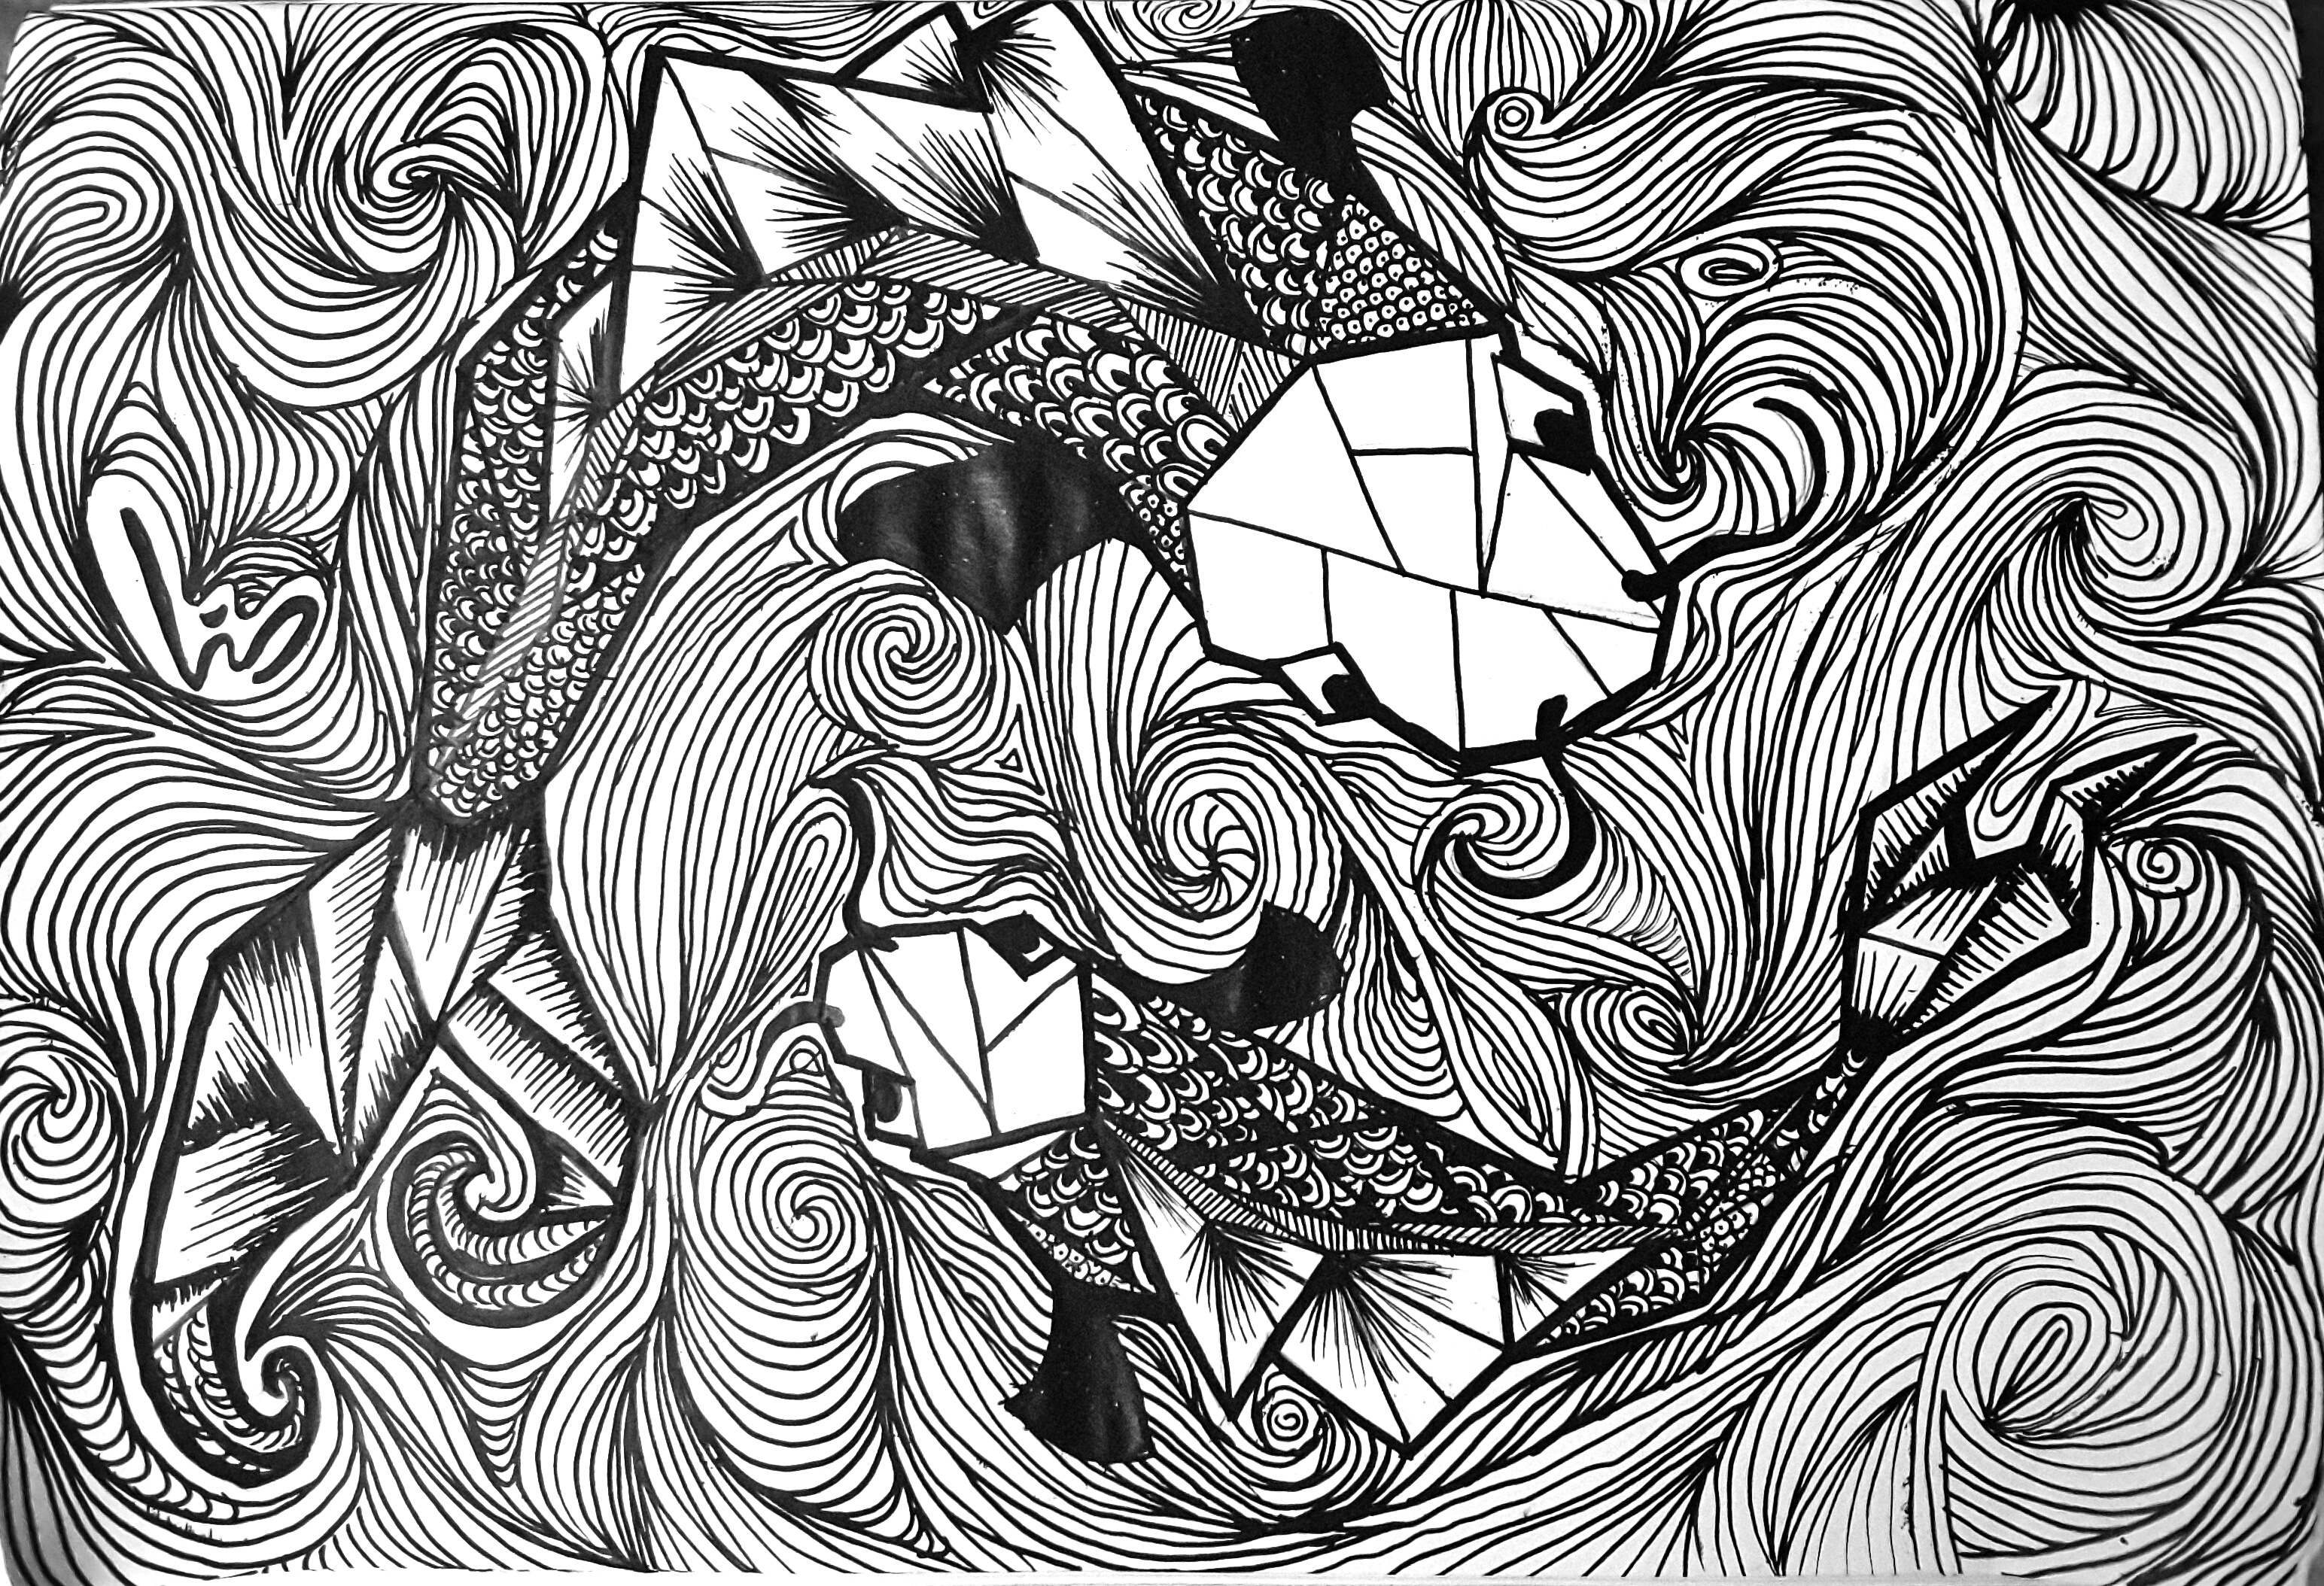 Geometric koi fish